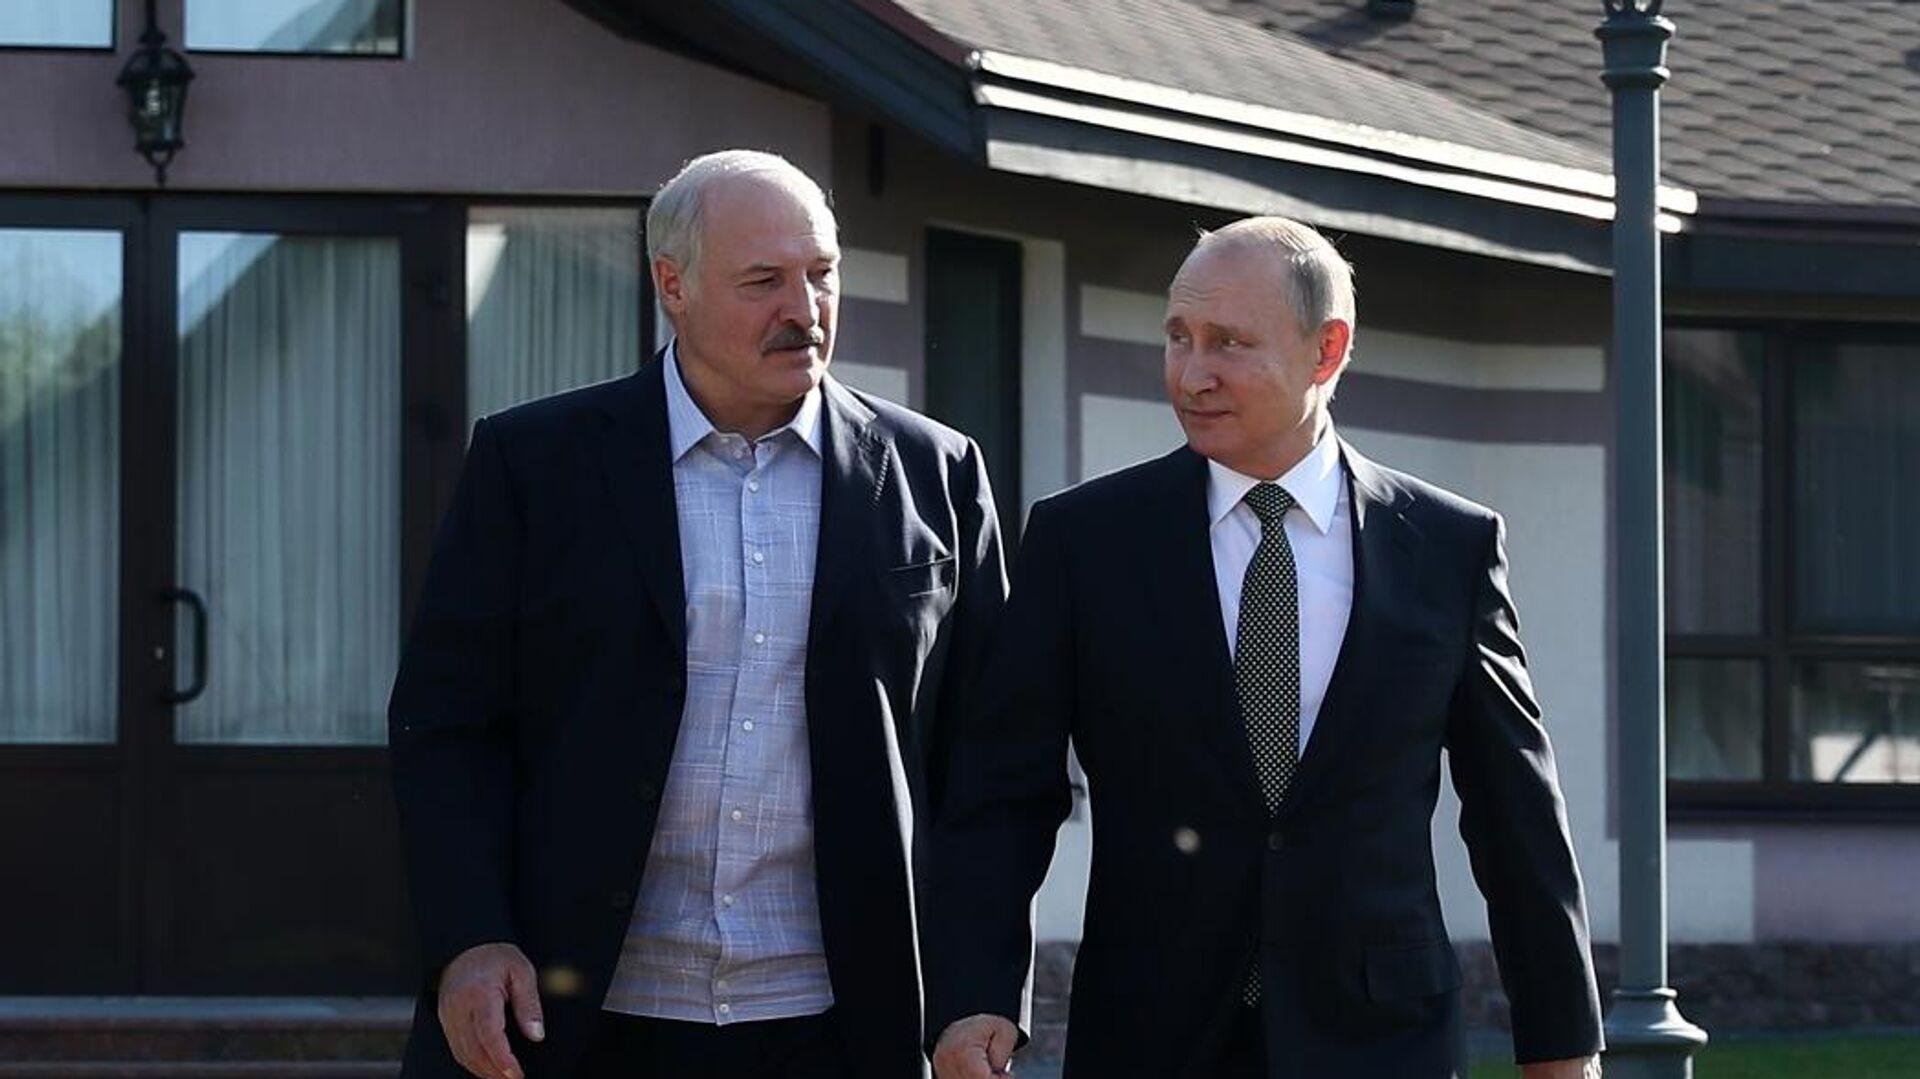 Президент РФ Владимир Путин и президент Белоруссии Александр Лукашенко - РИА Новости, 1920, 30.10.2020